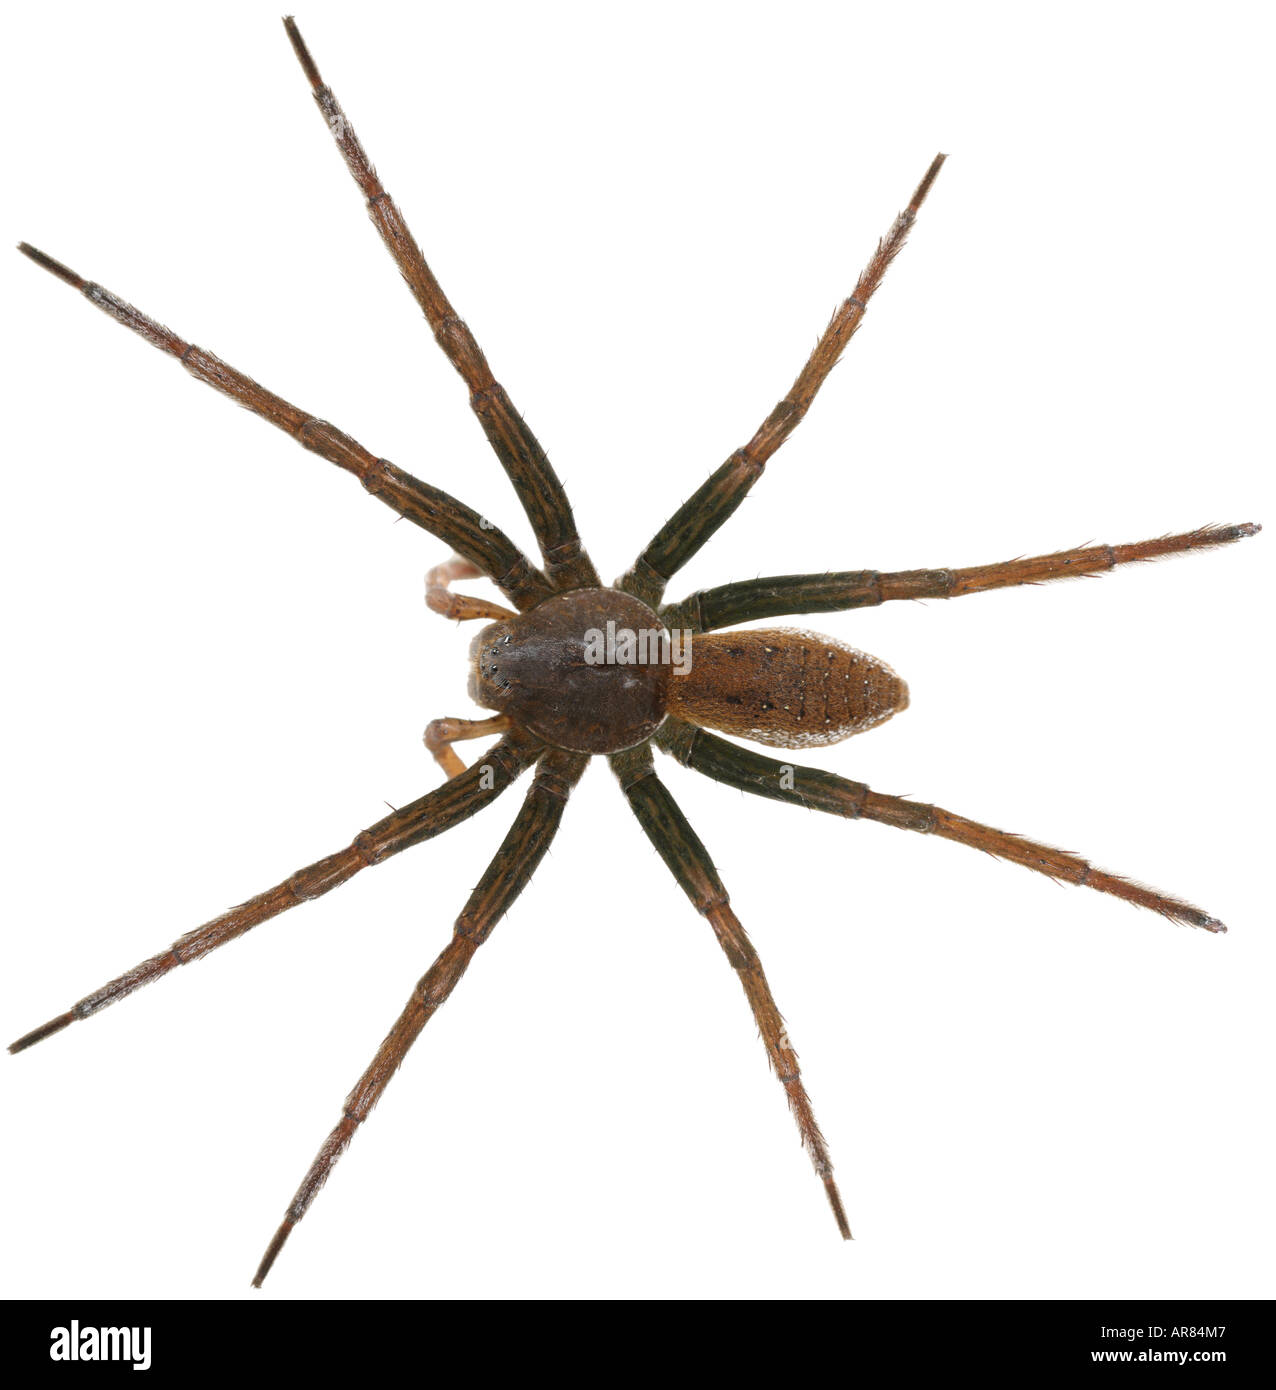 Fen Raft Spider Dolomedes plantarius, a fishing spider on white background Stock Photo